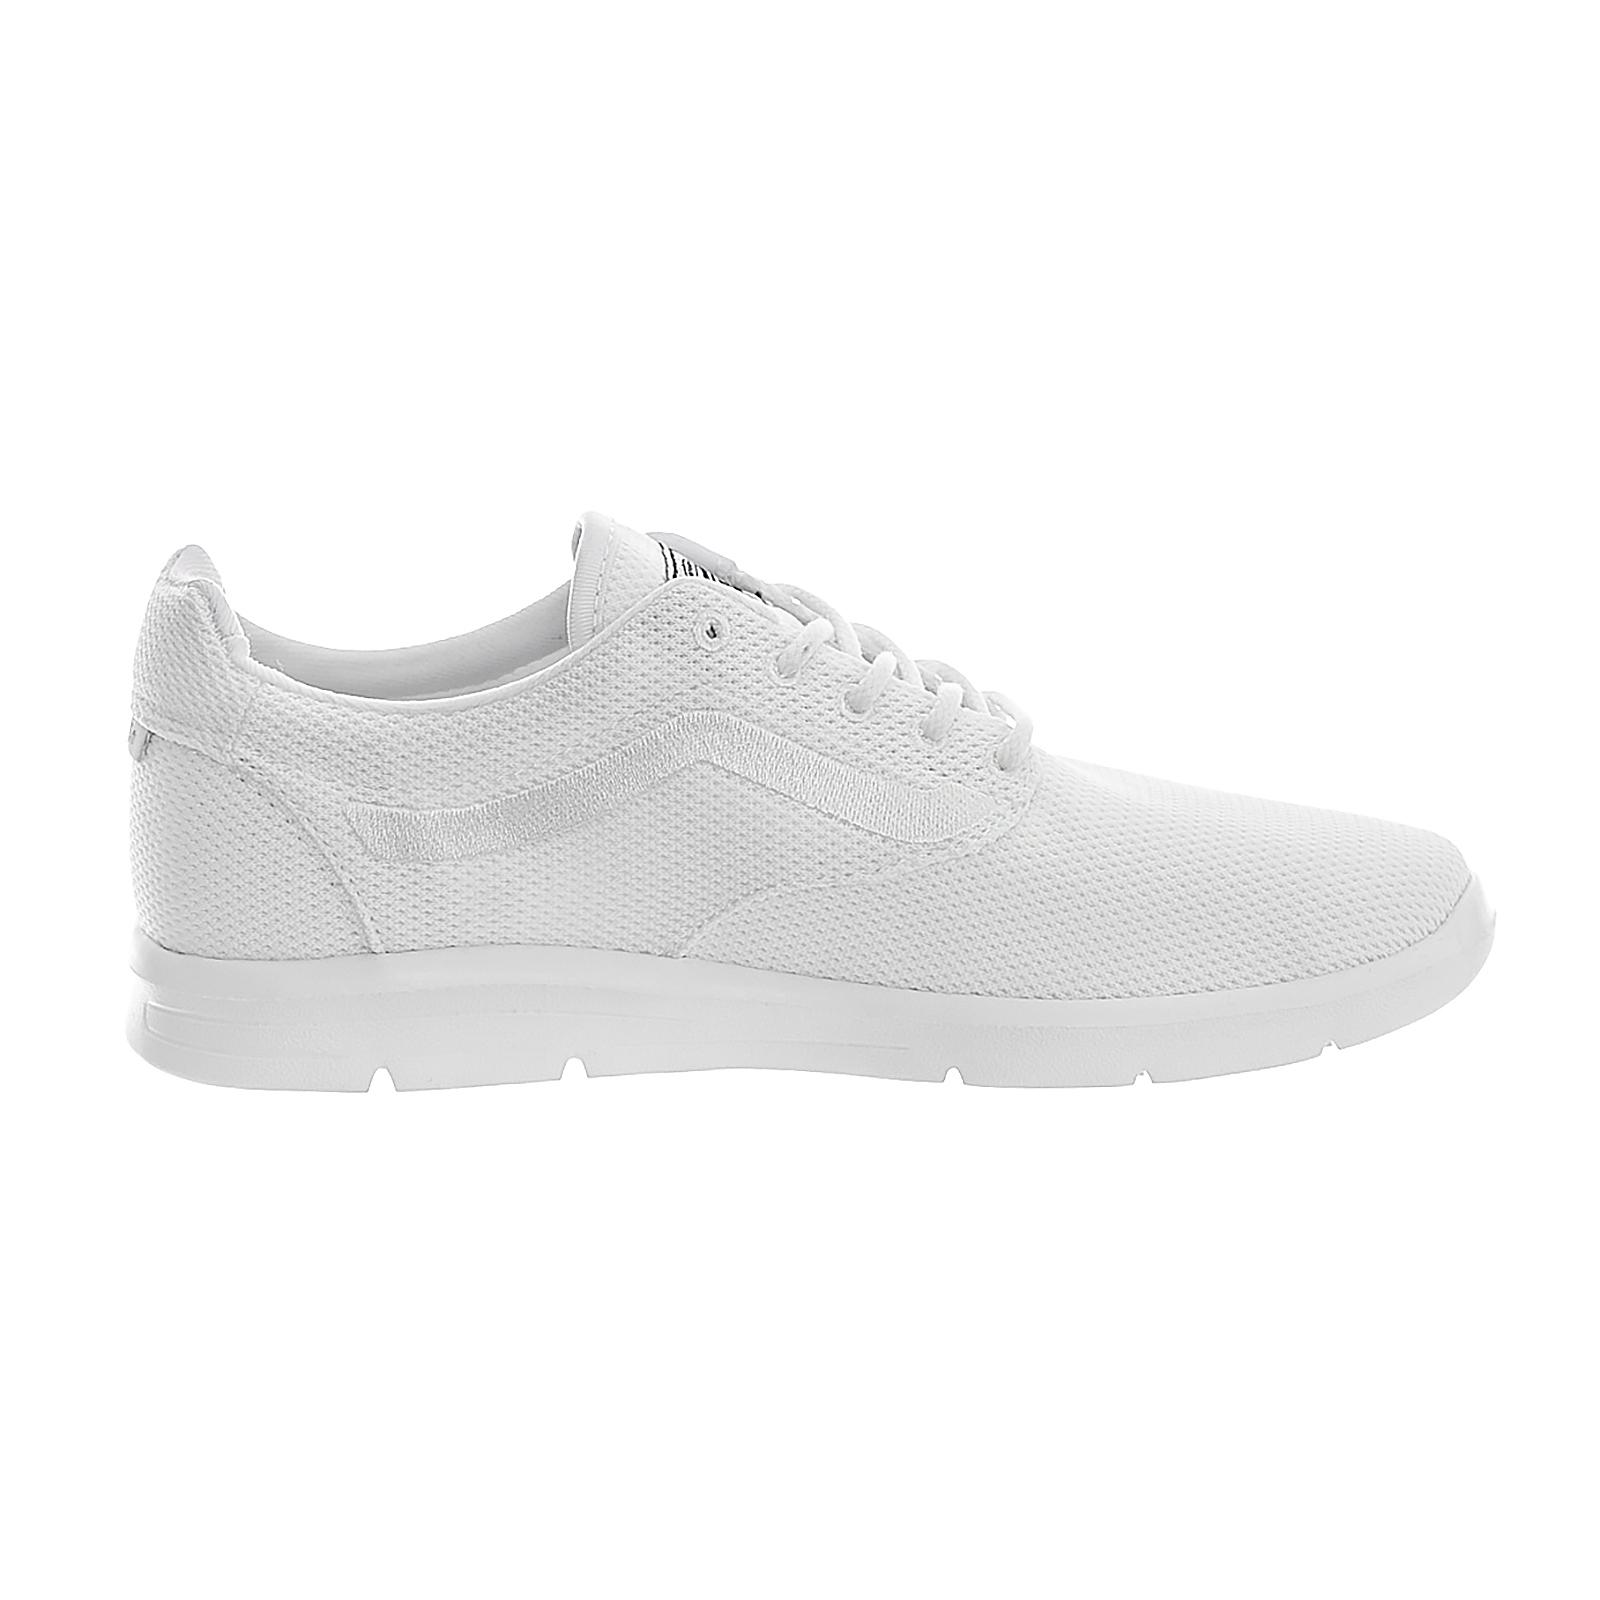 Vans (Mesh) Sneakers Ua Iso 1.5 (Mesh) Vans True Weiß 47795d Bianco 47795d Weiß ... d53a8b